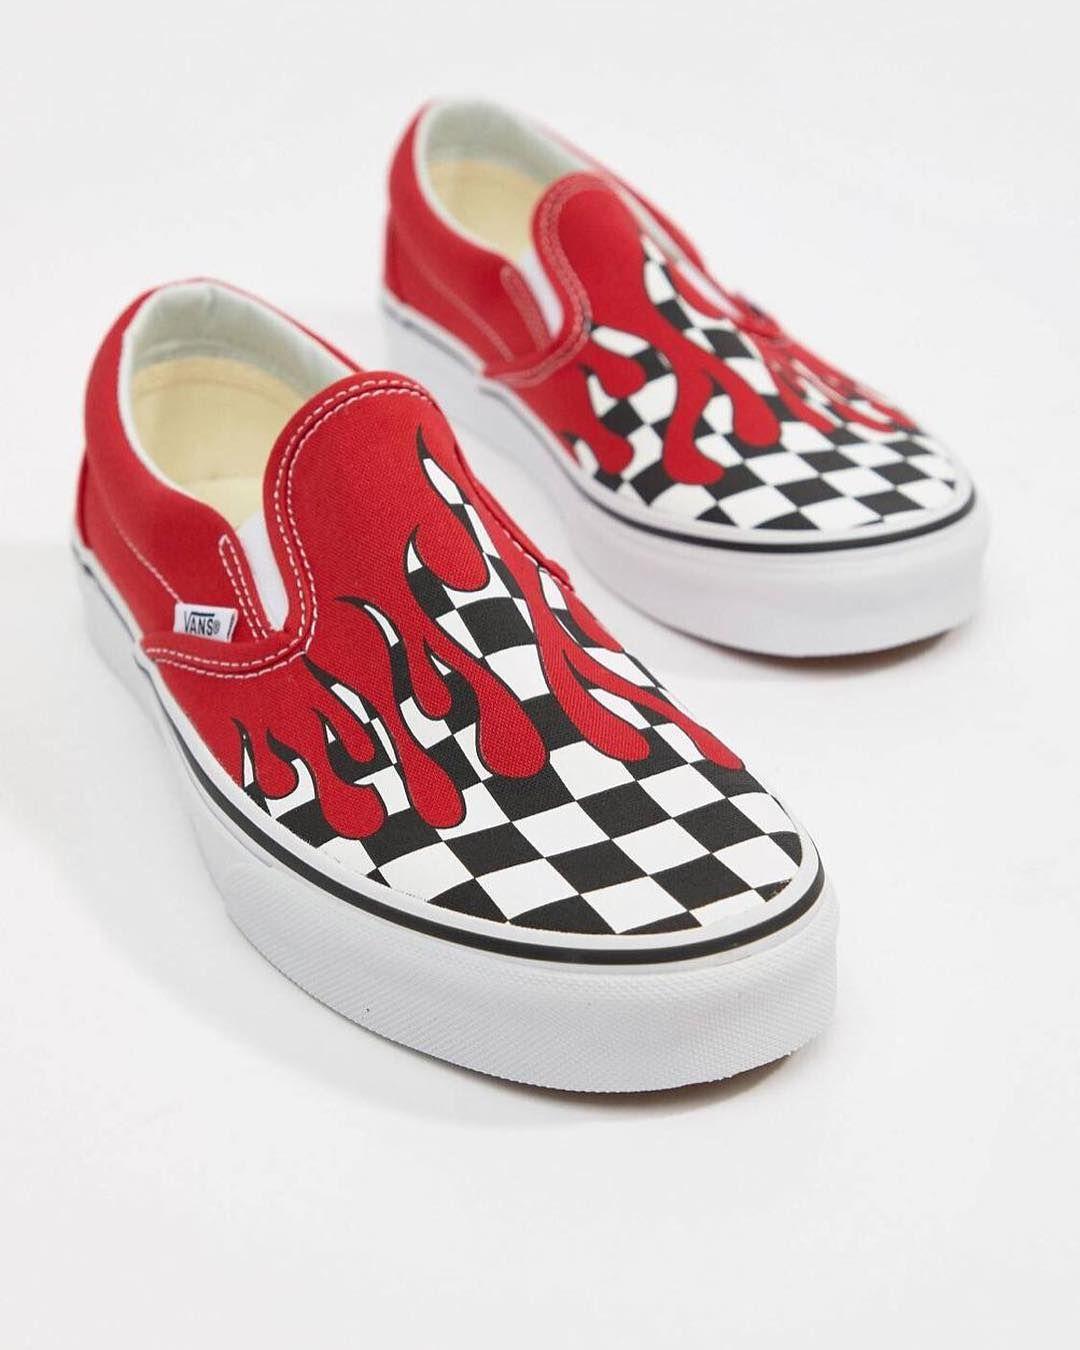 preorder Vans Slip-On Checkerboard